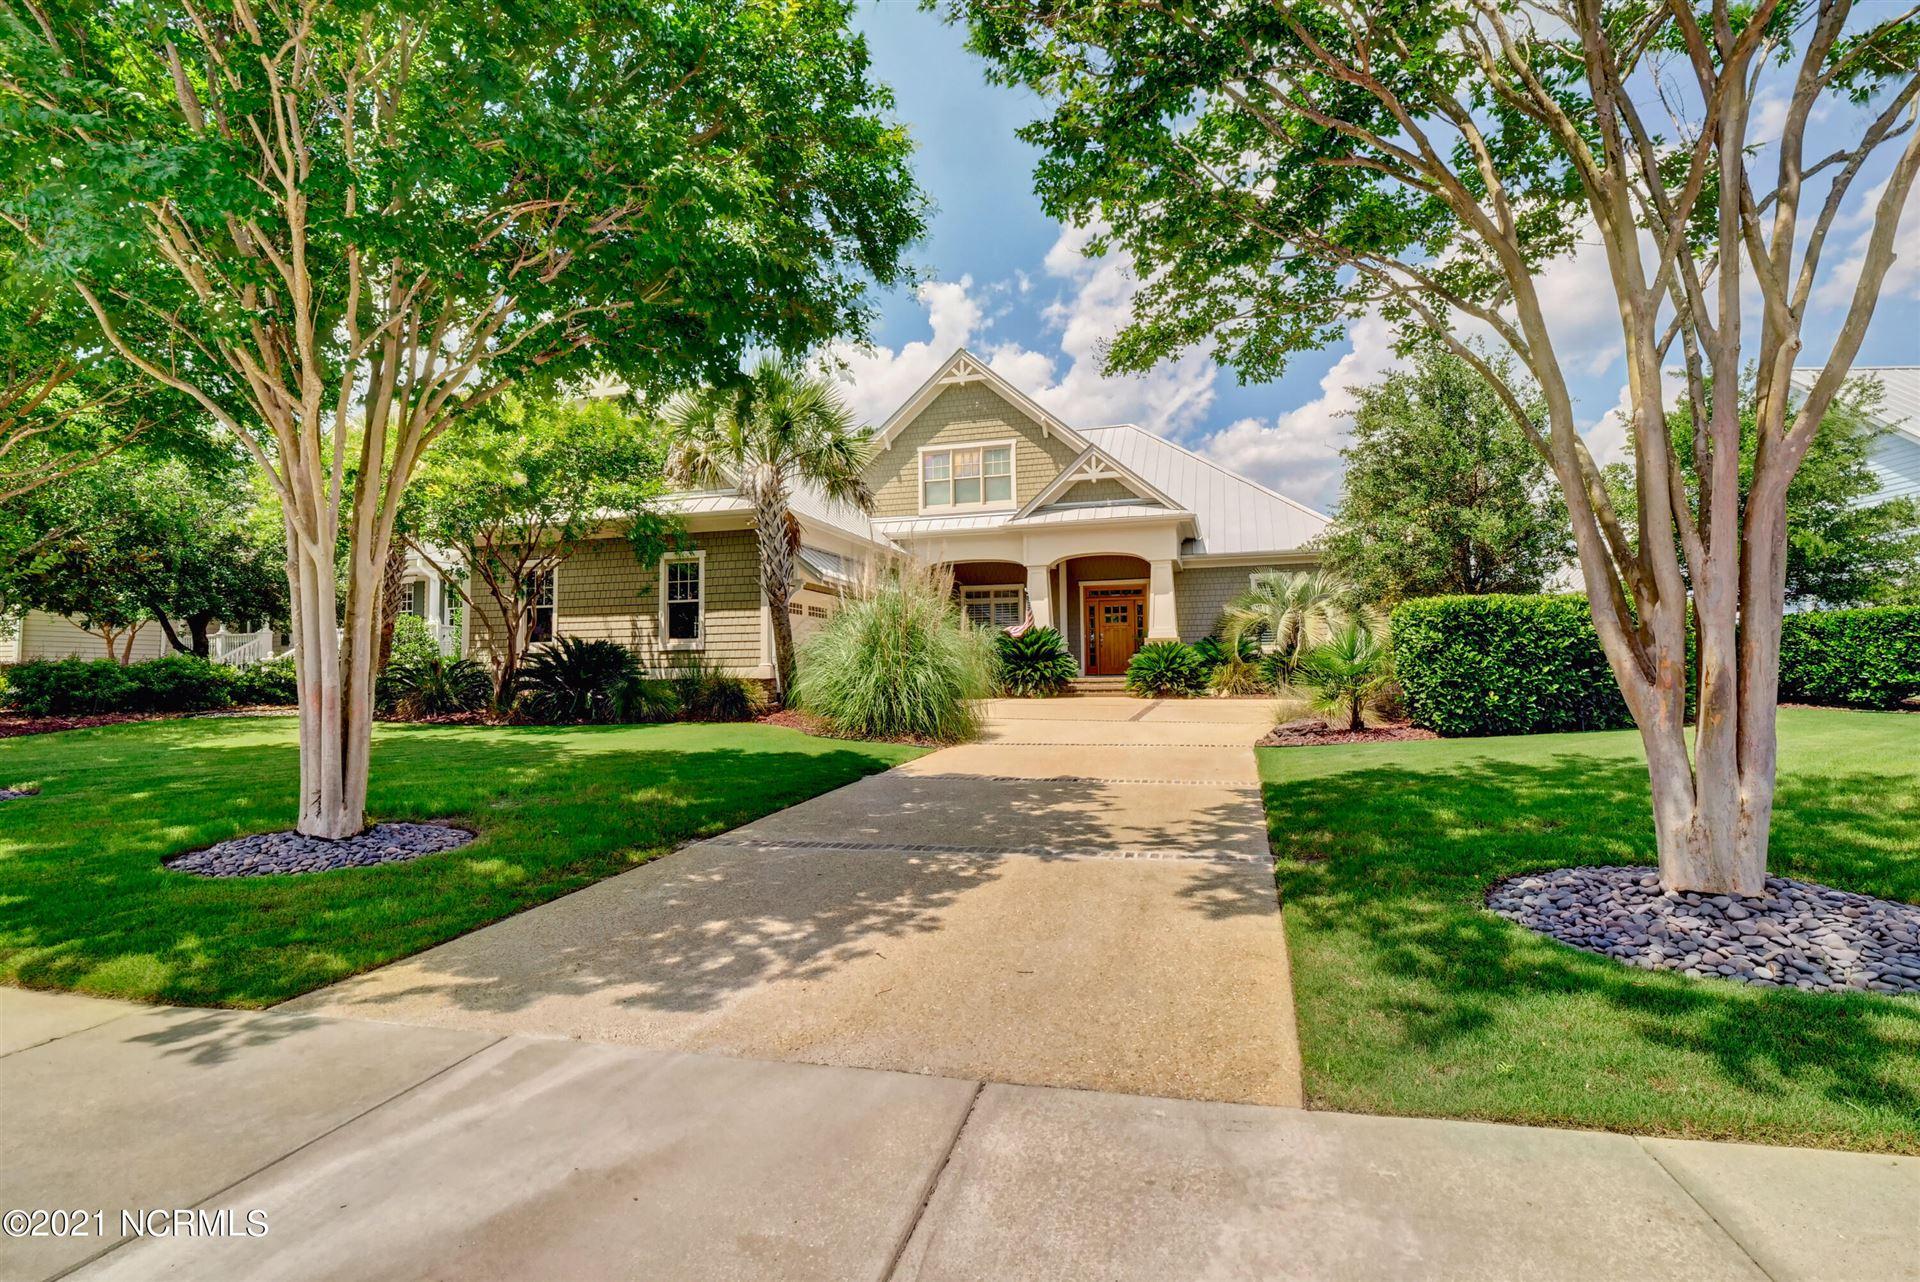 Photo of 513 Moss Tree Drive, Wilmington, NC 28405 (MLS # 100289841)